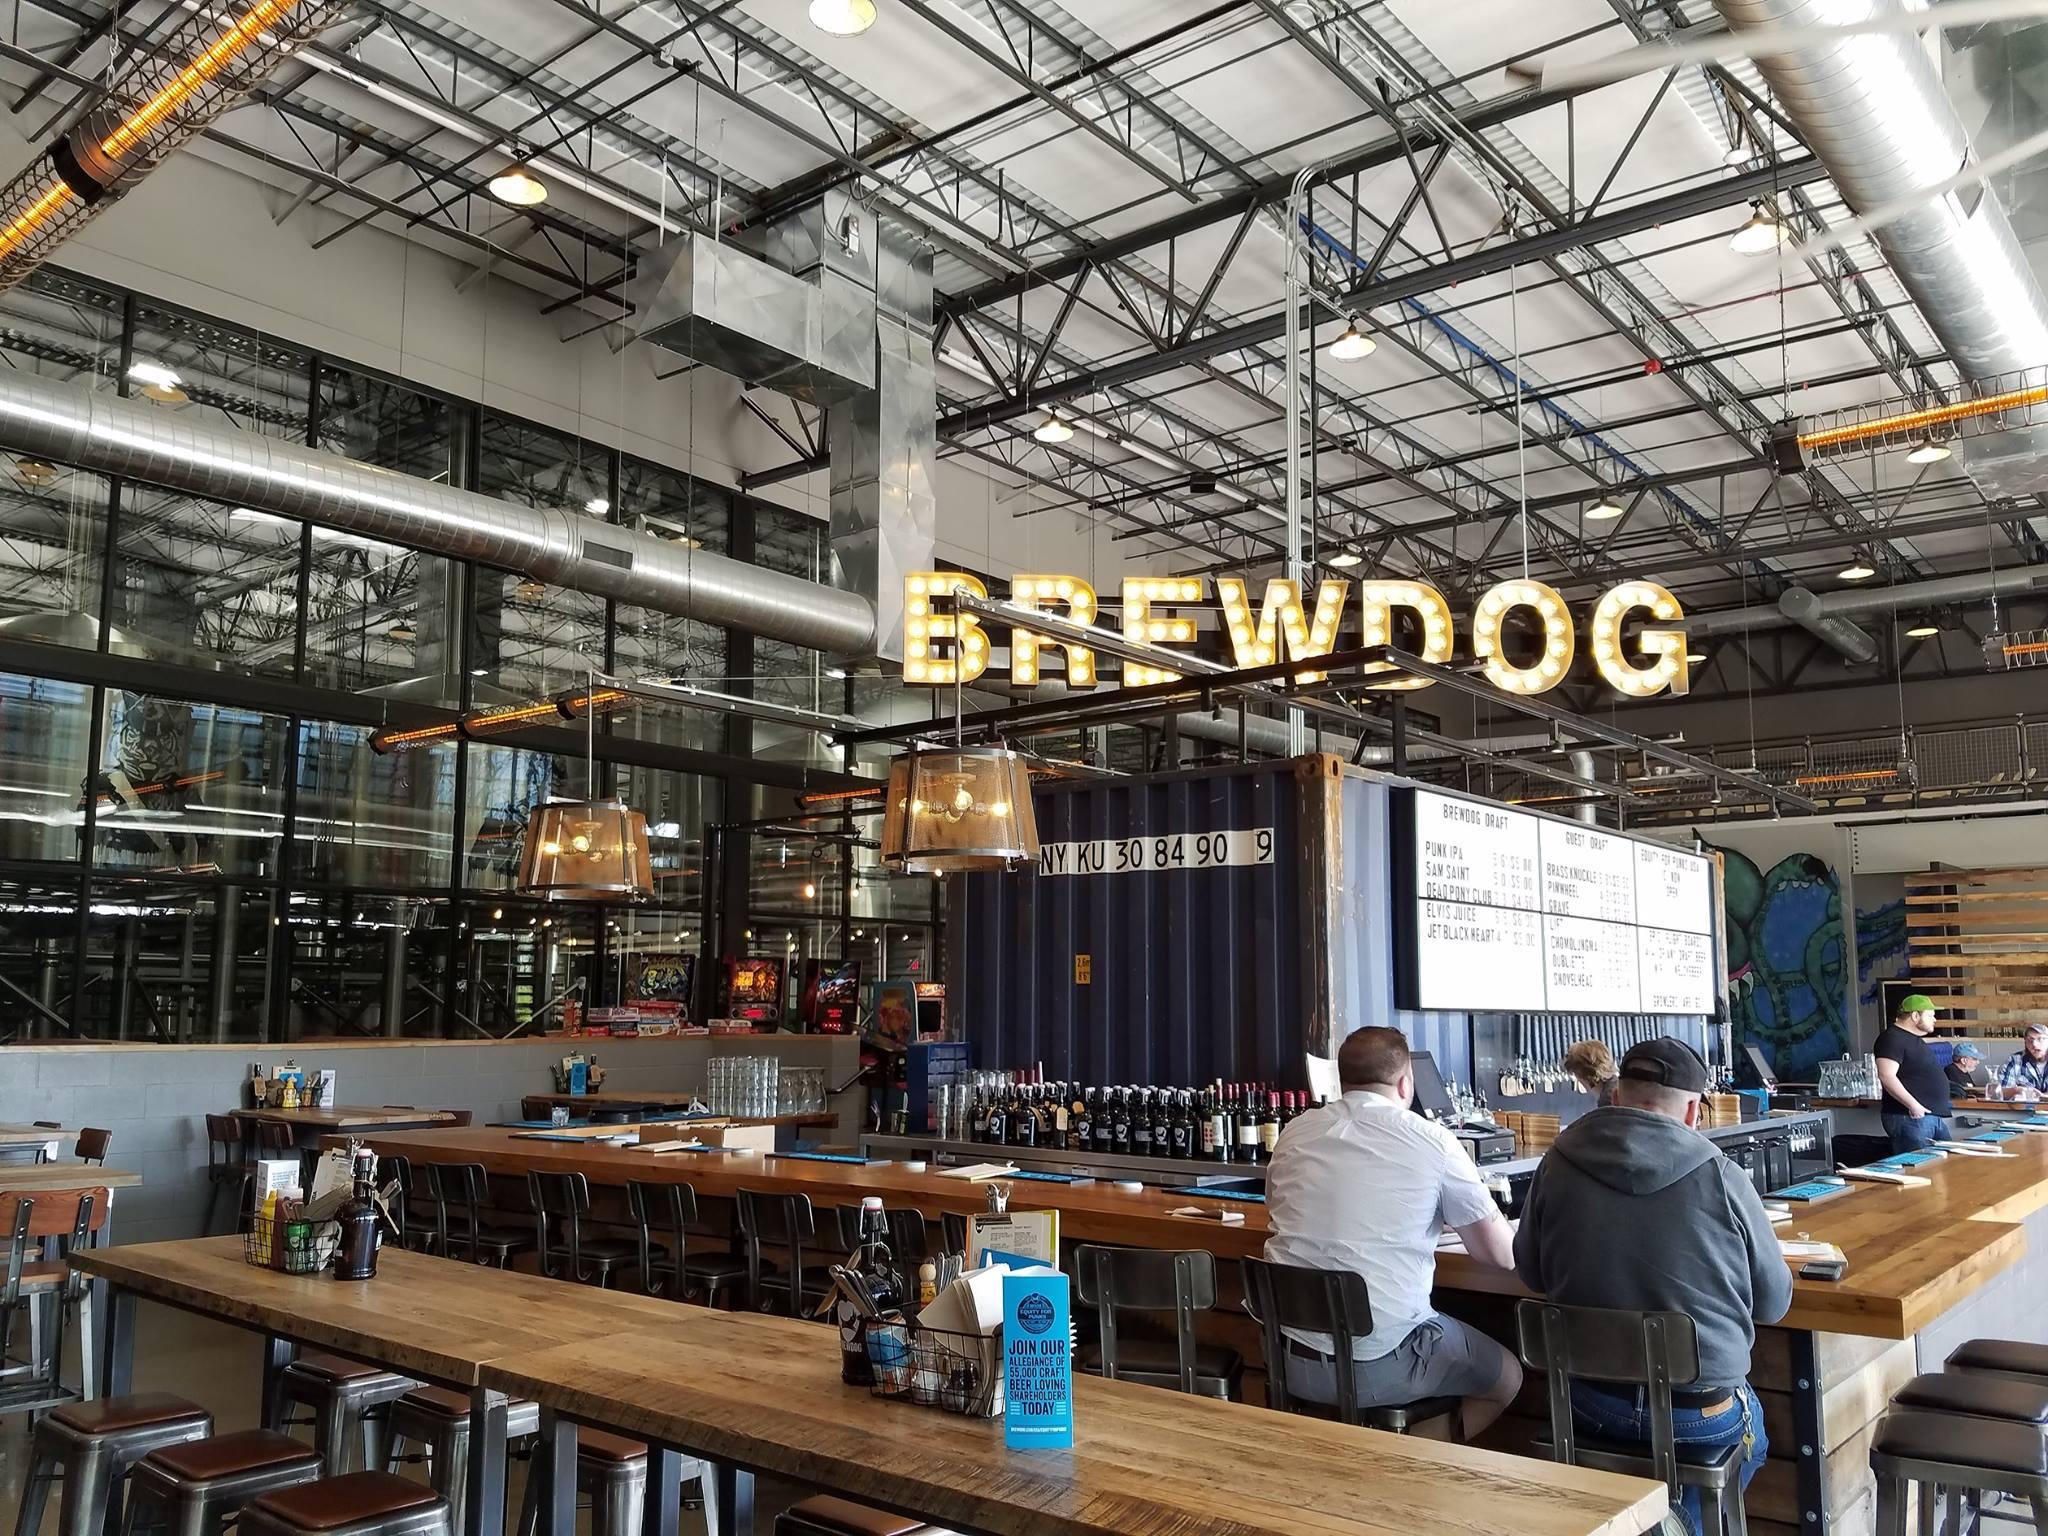 brewdog - photo #45